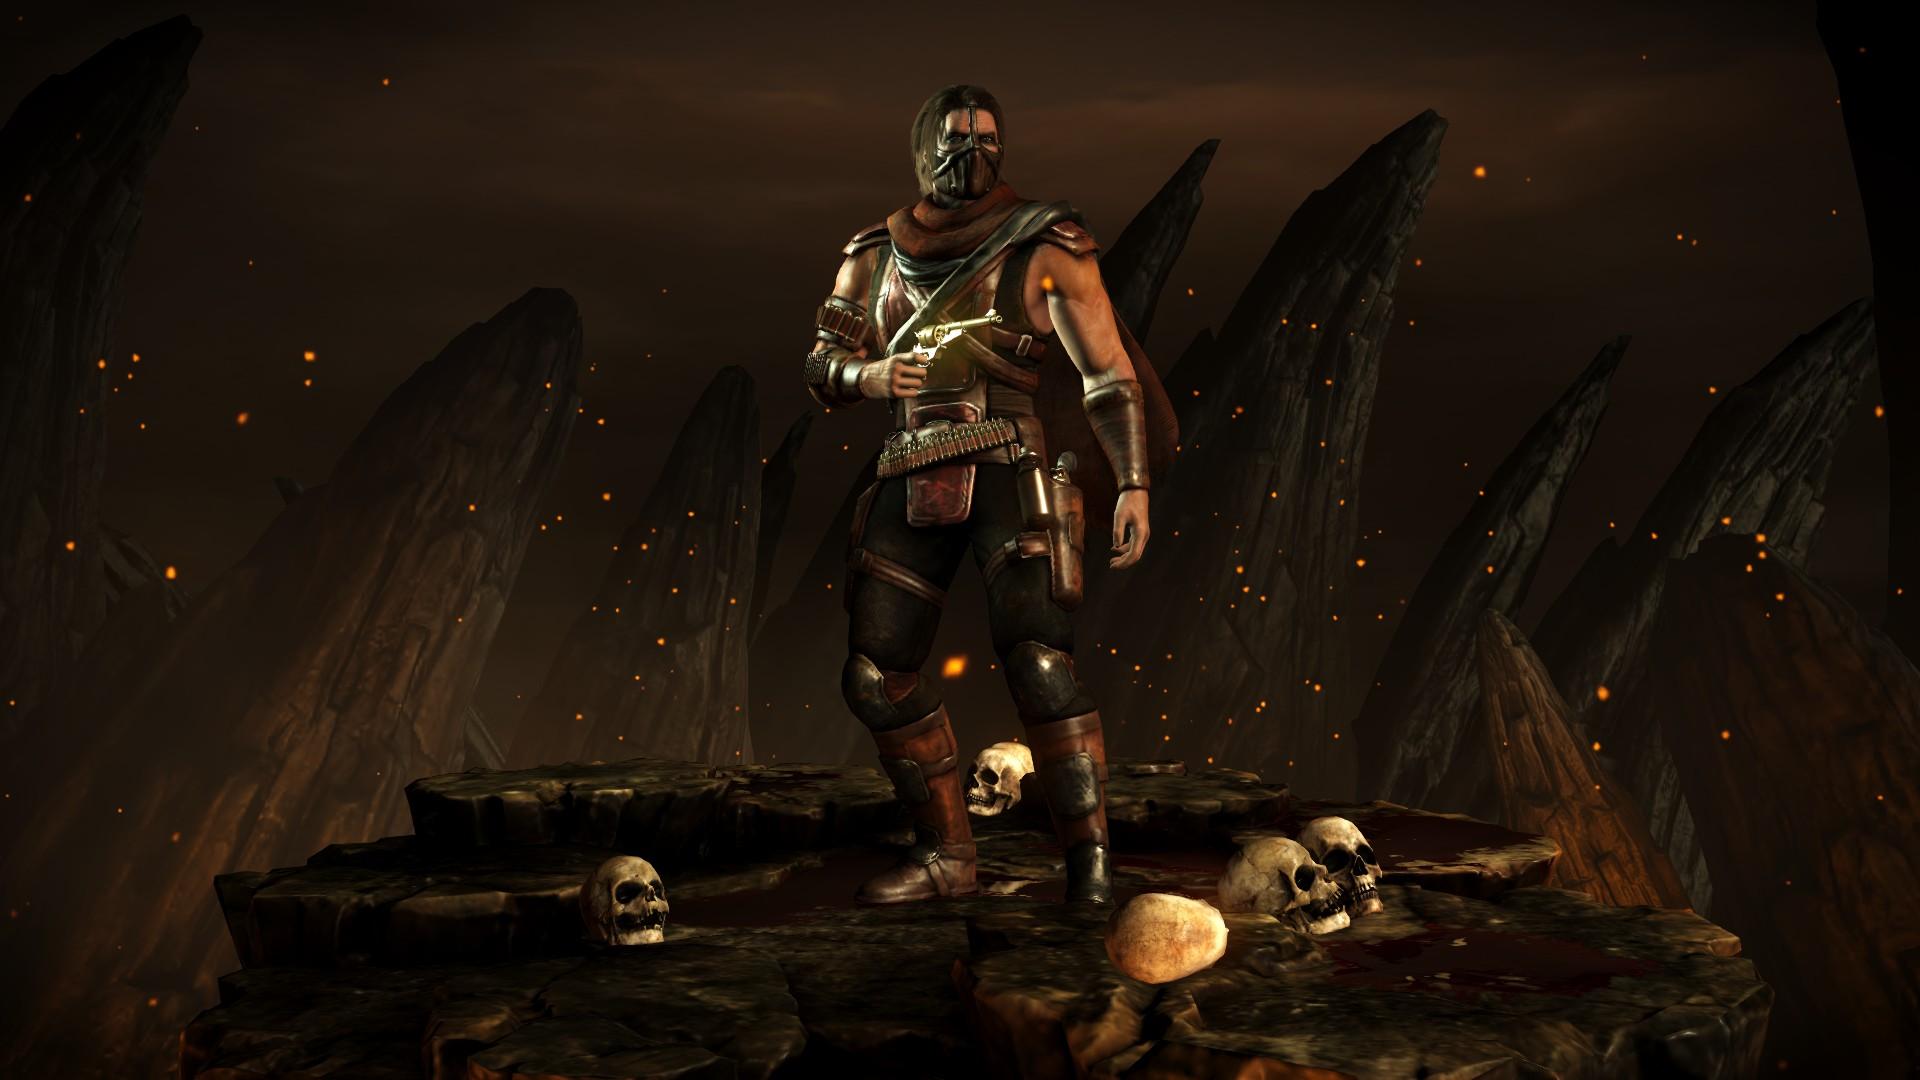 Эррон Блэк - Mortal Kombat X Эррон Блэк